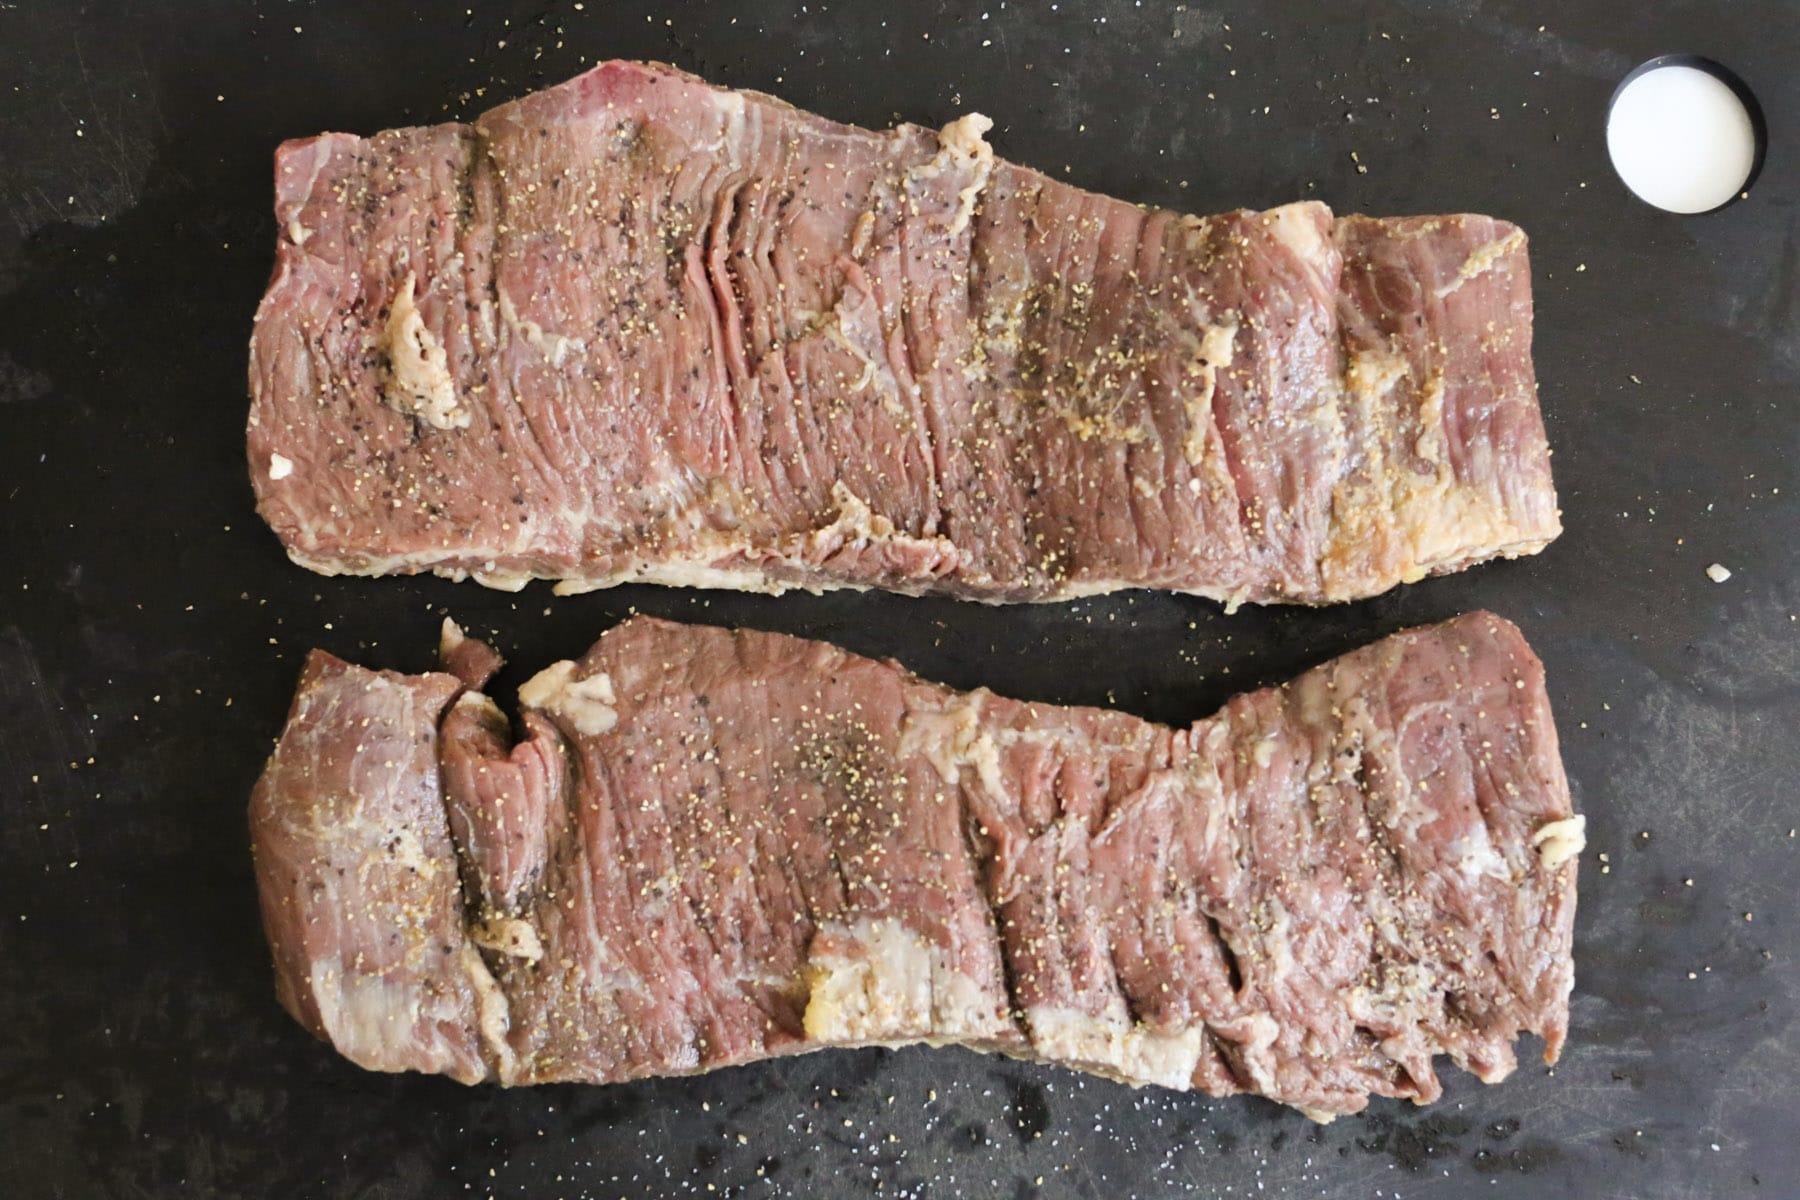 Marinated-Skirt-Steak-with-Corn-and-Sweet-Cherry-Salad-step-5